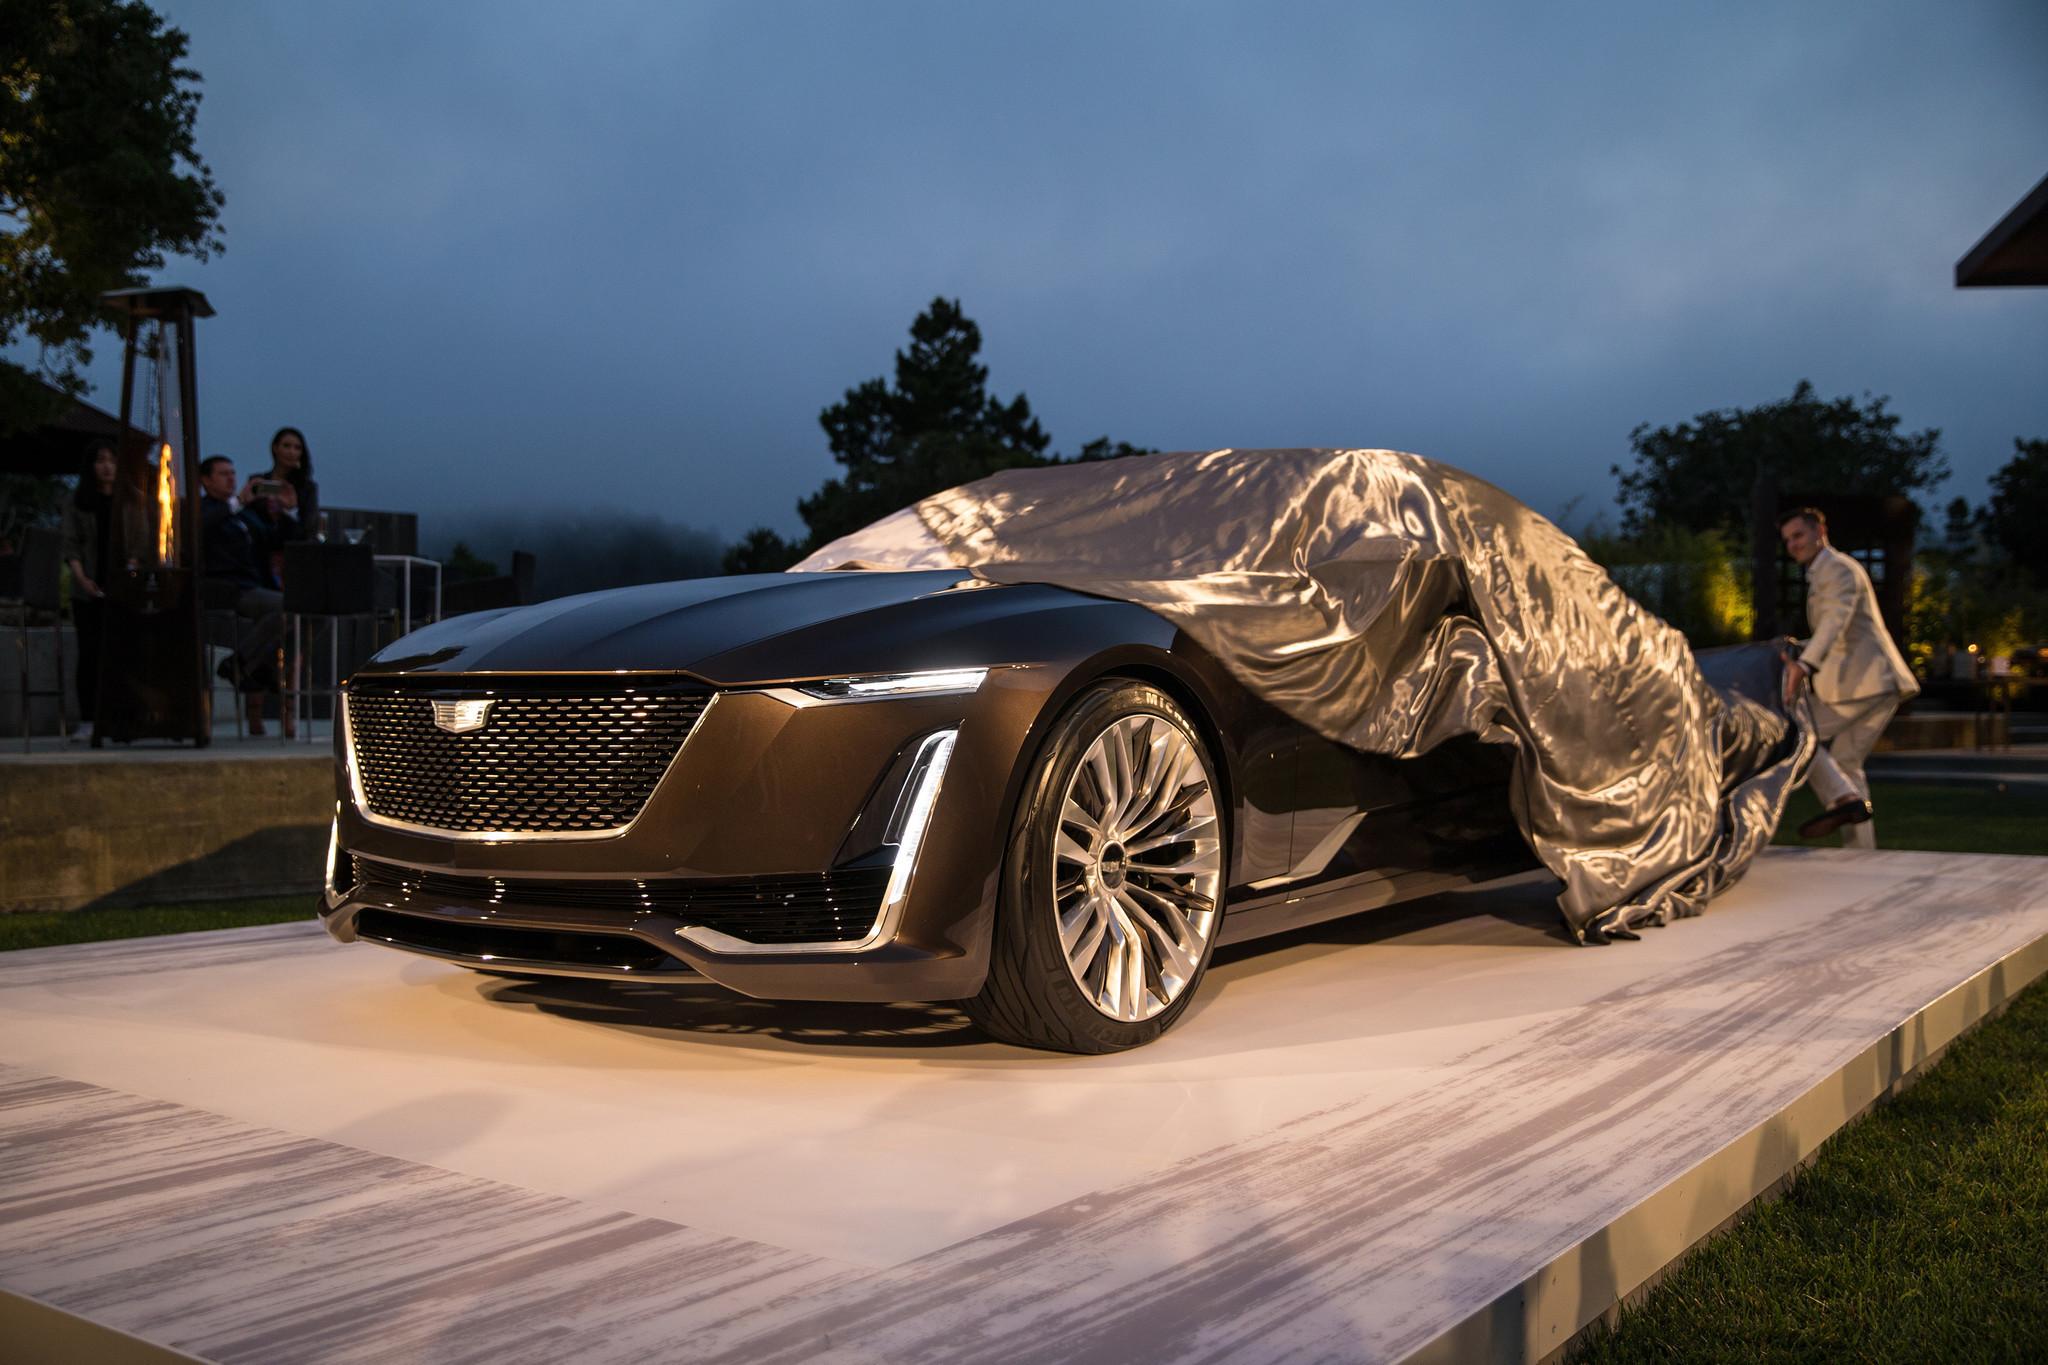 Vision Mercedes Maybach 6 And Cadillac Escala Concept Cars